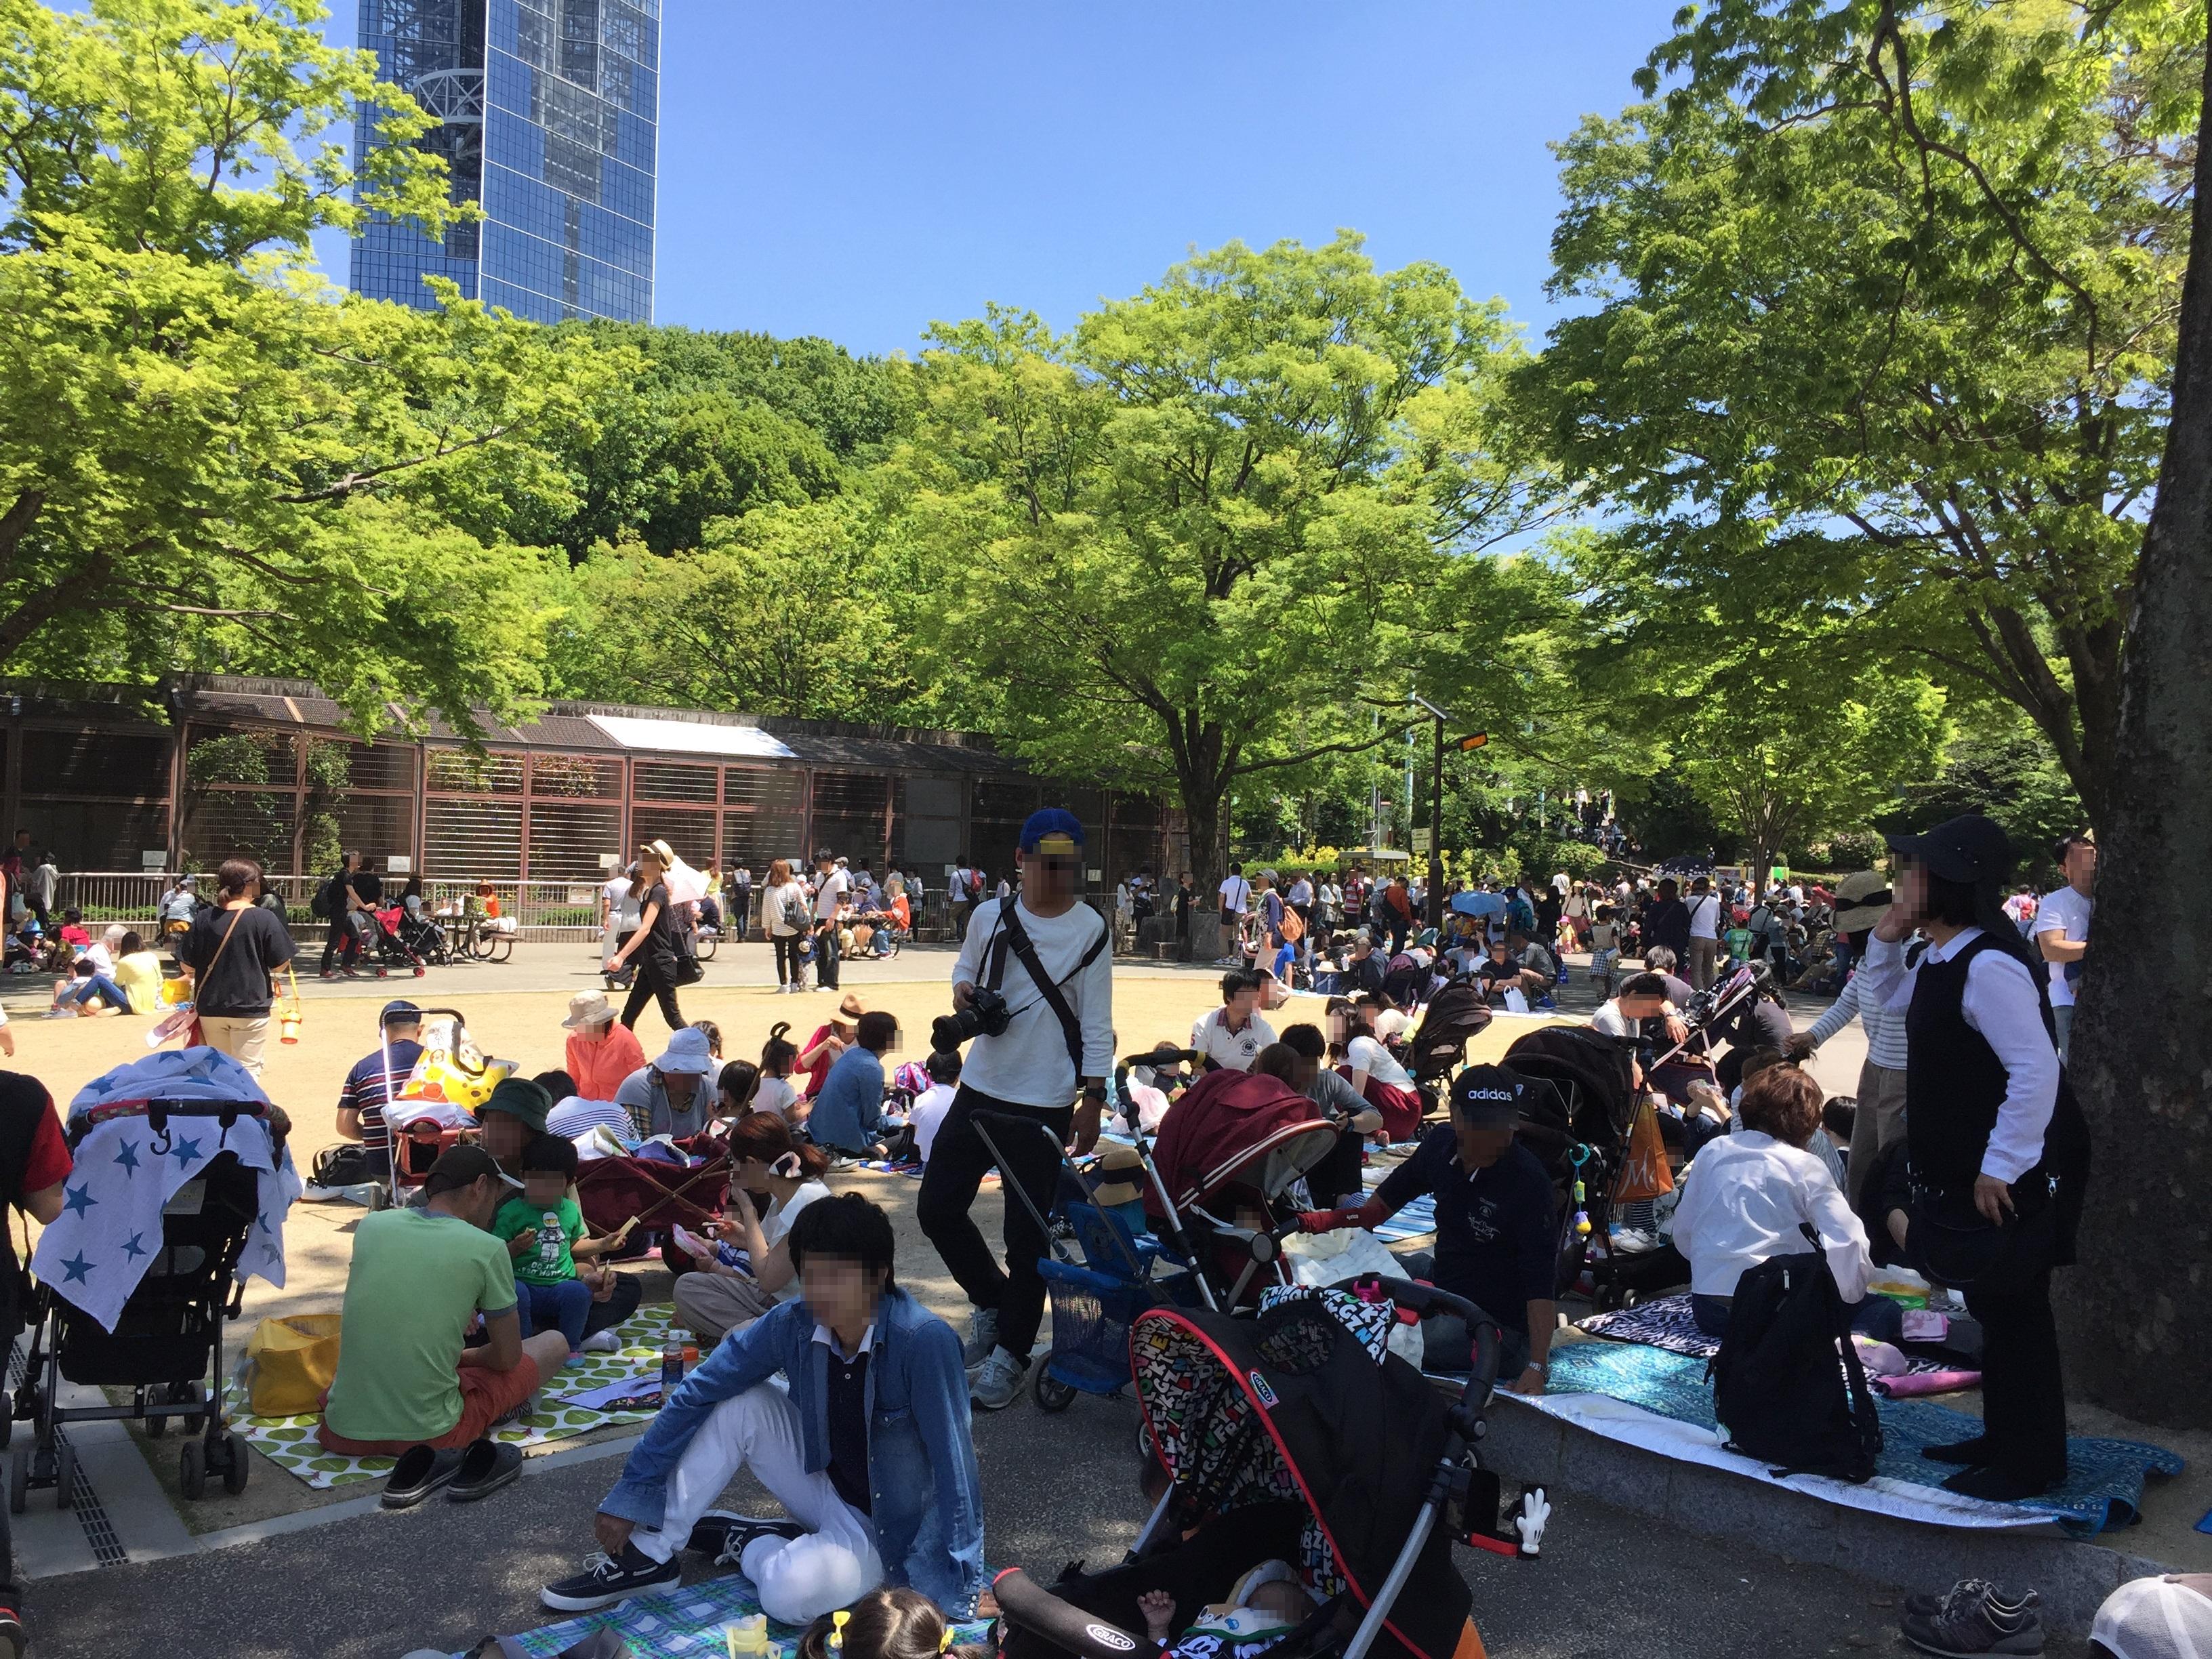 higashiyama-zoo-lunch